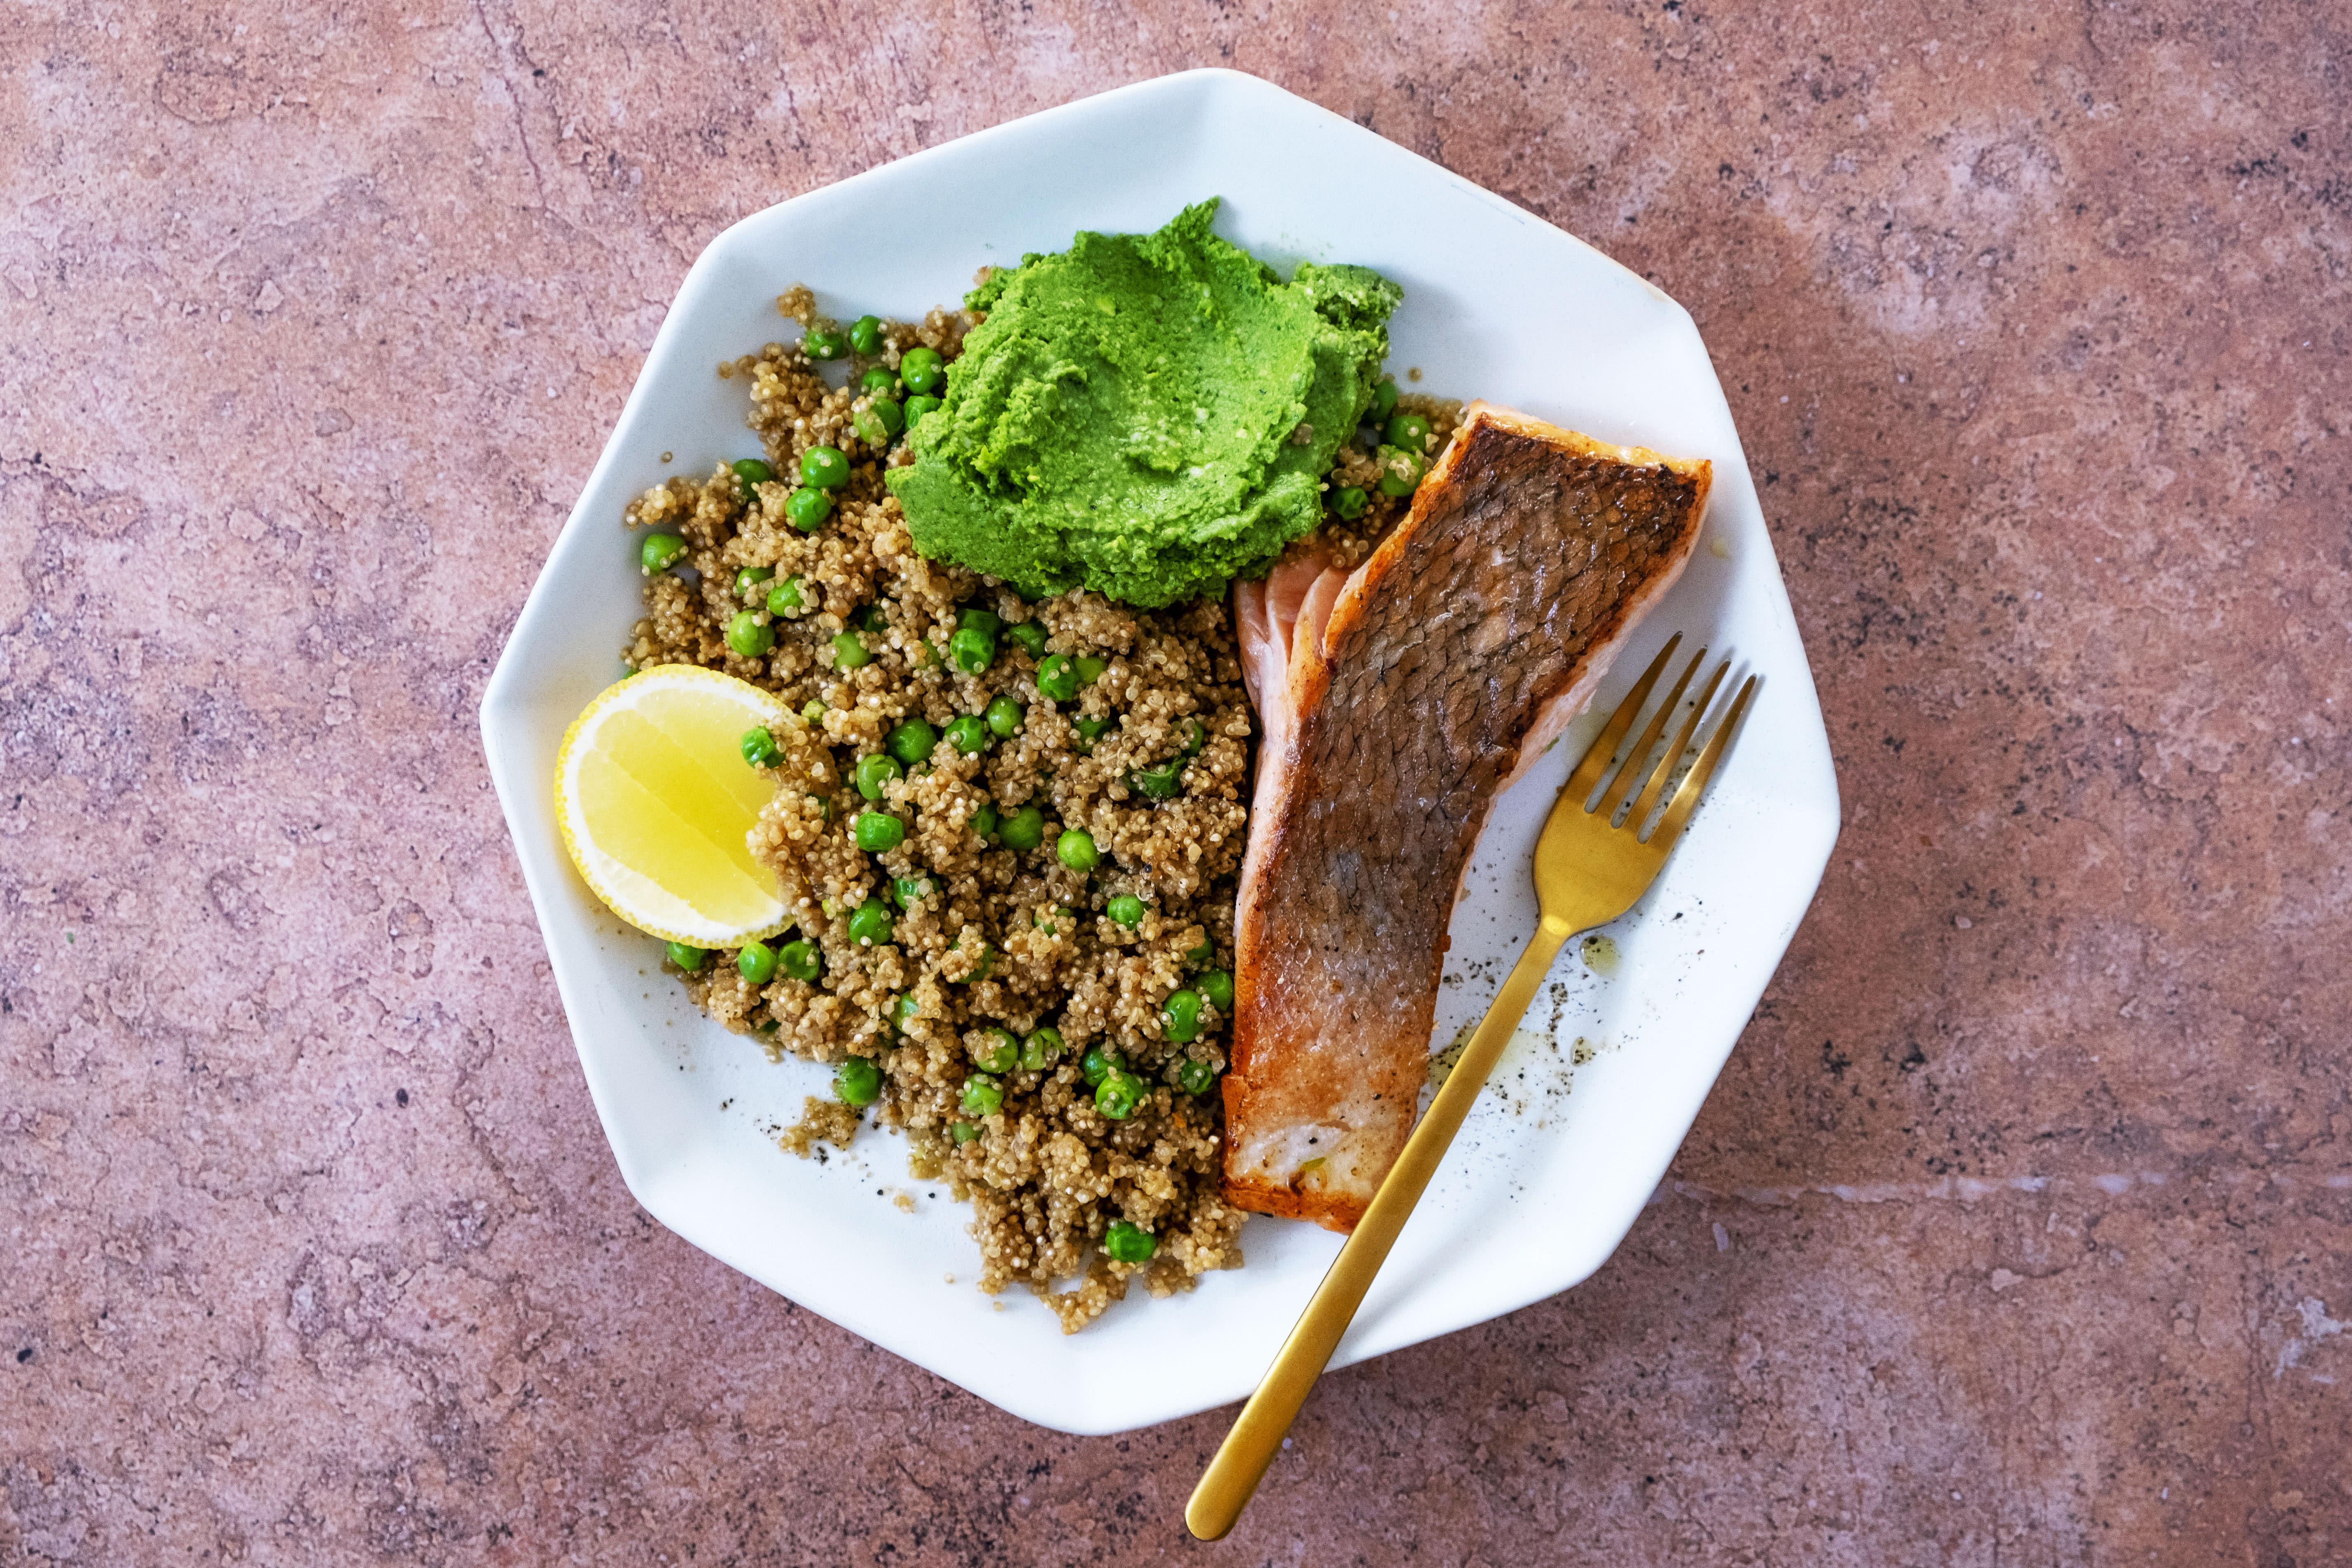 Pan Fried Salmon with Green Pea Quinoa and Basil Pesto